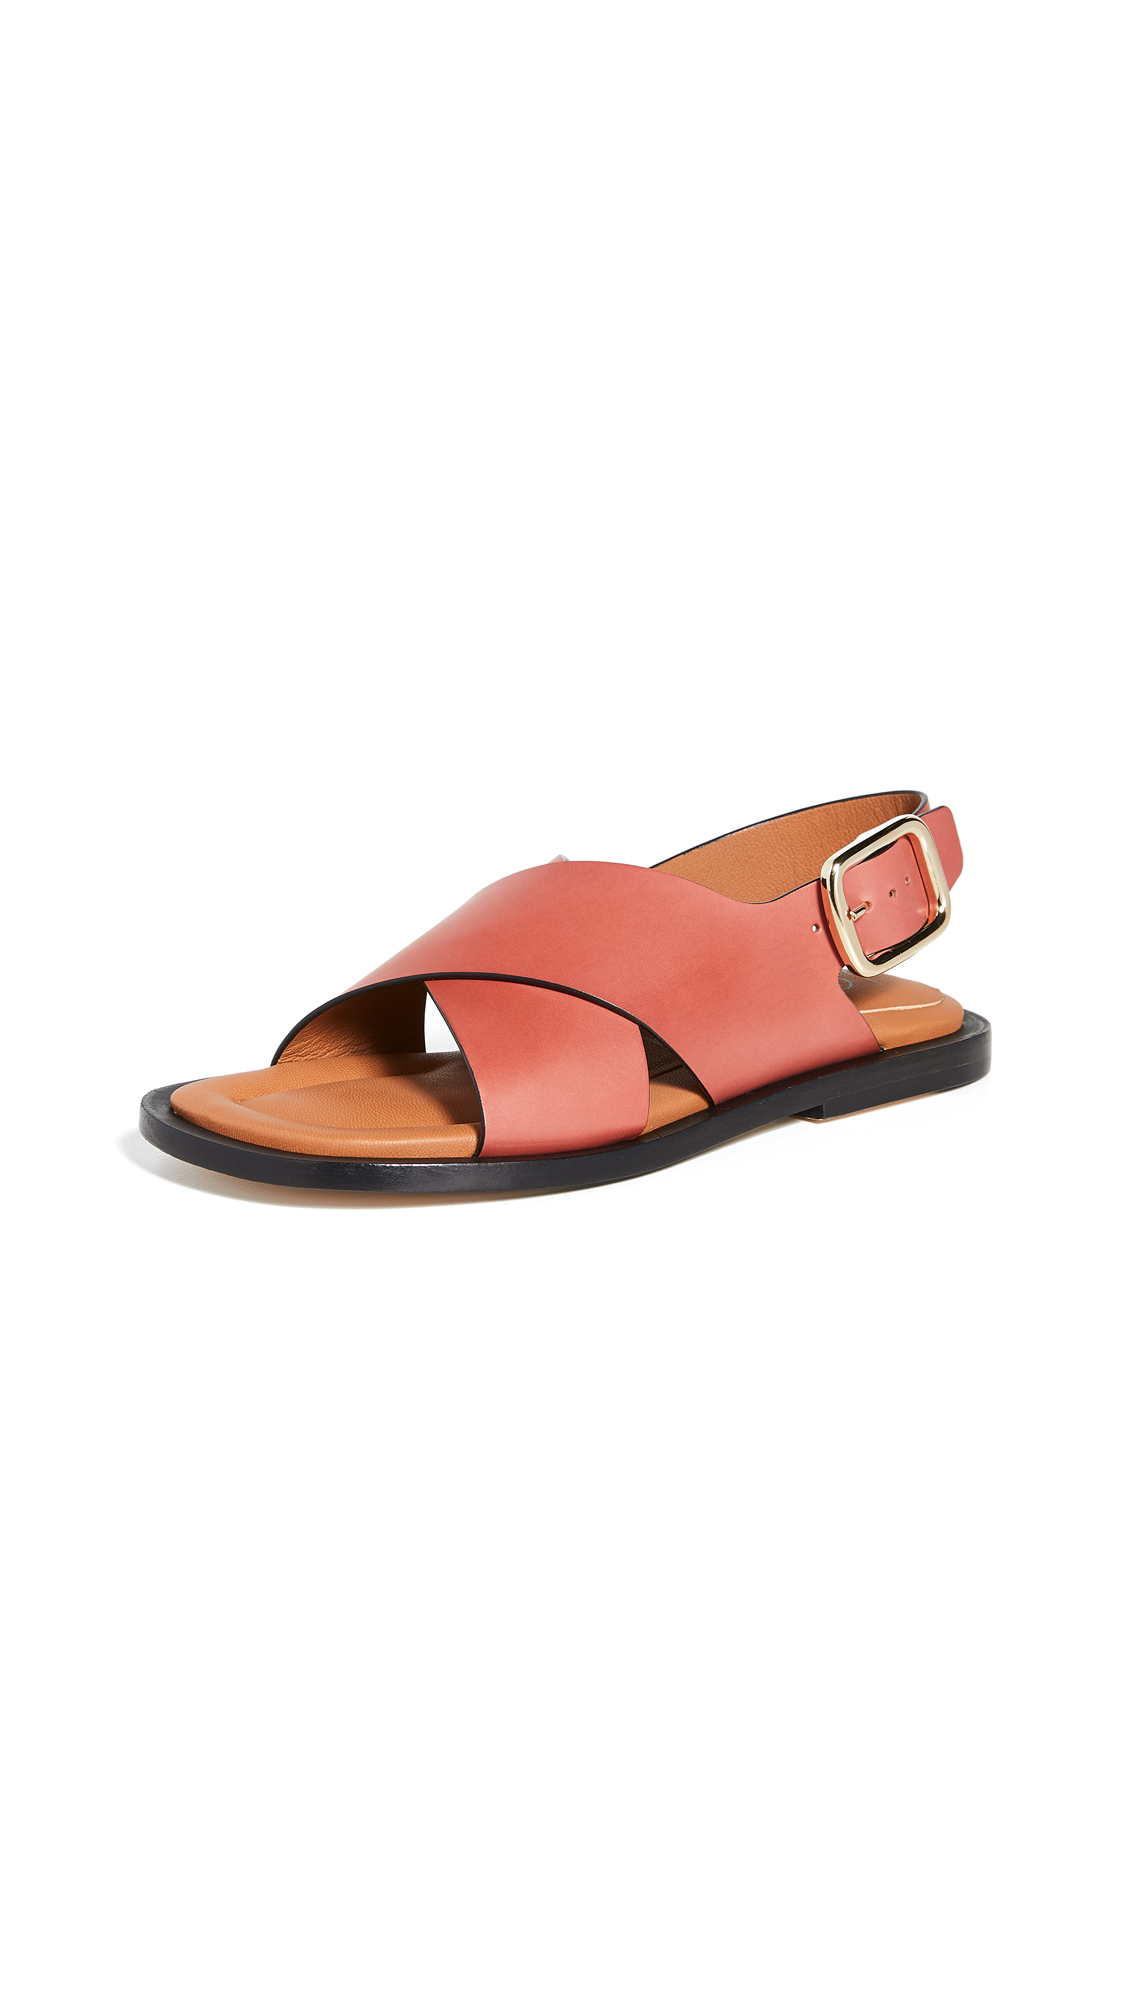 Joseph Leather Crisscross Sandals In Siena